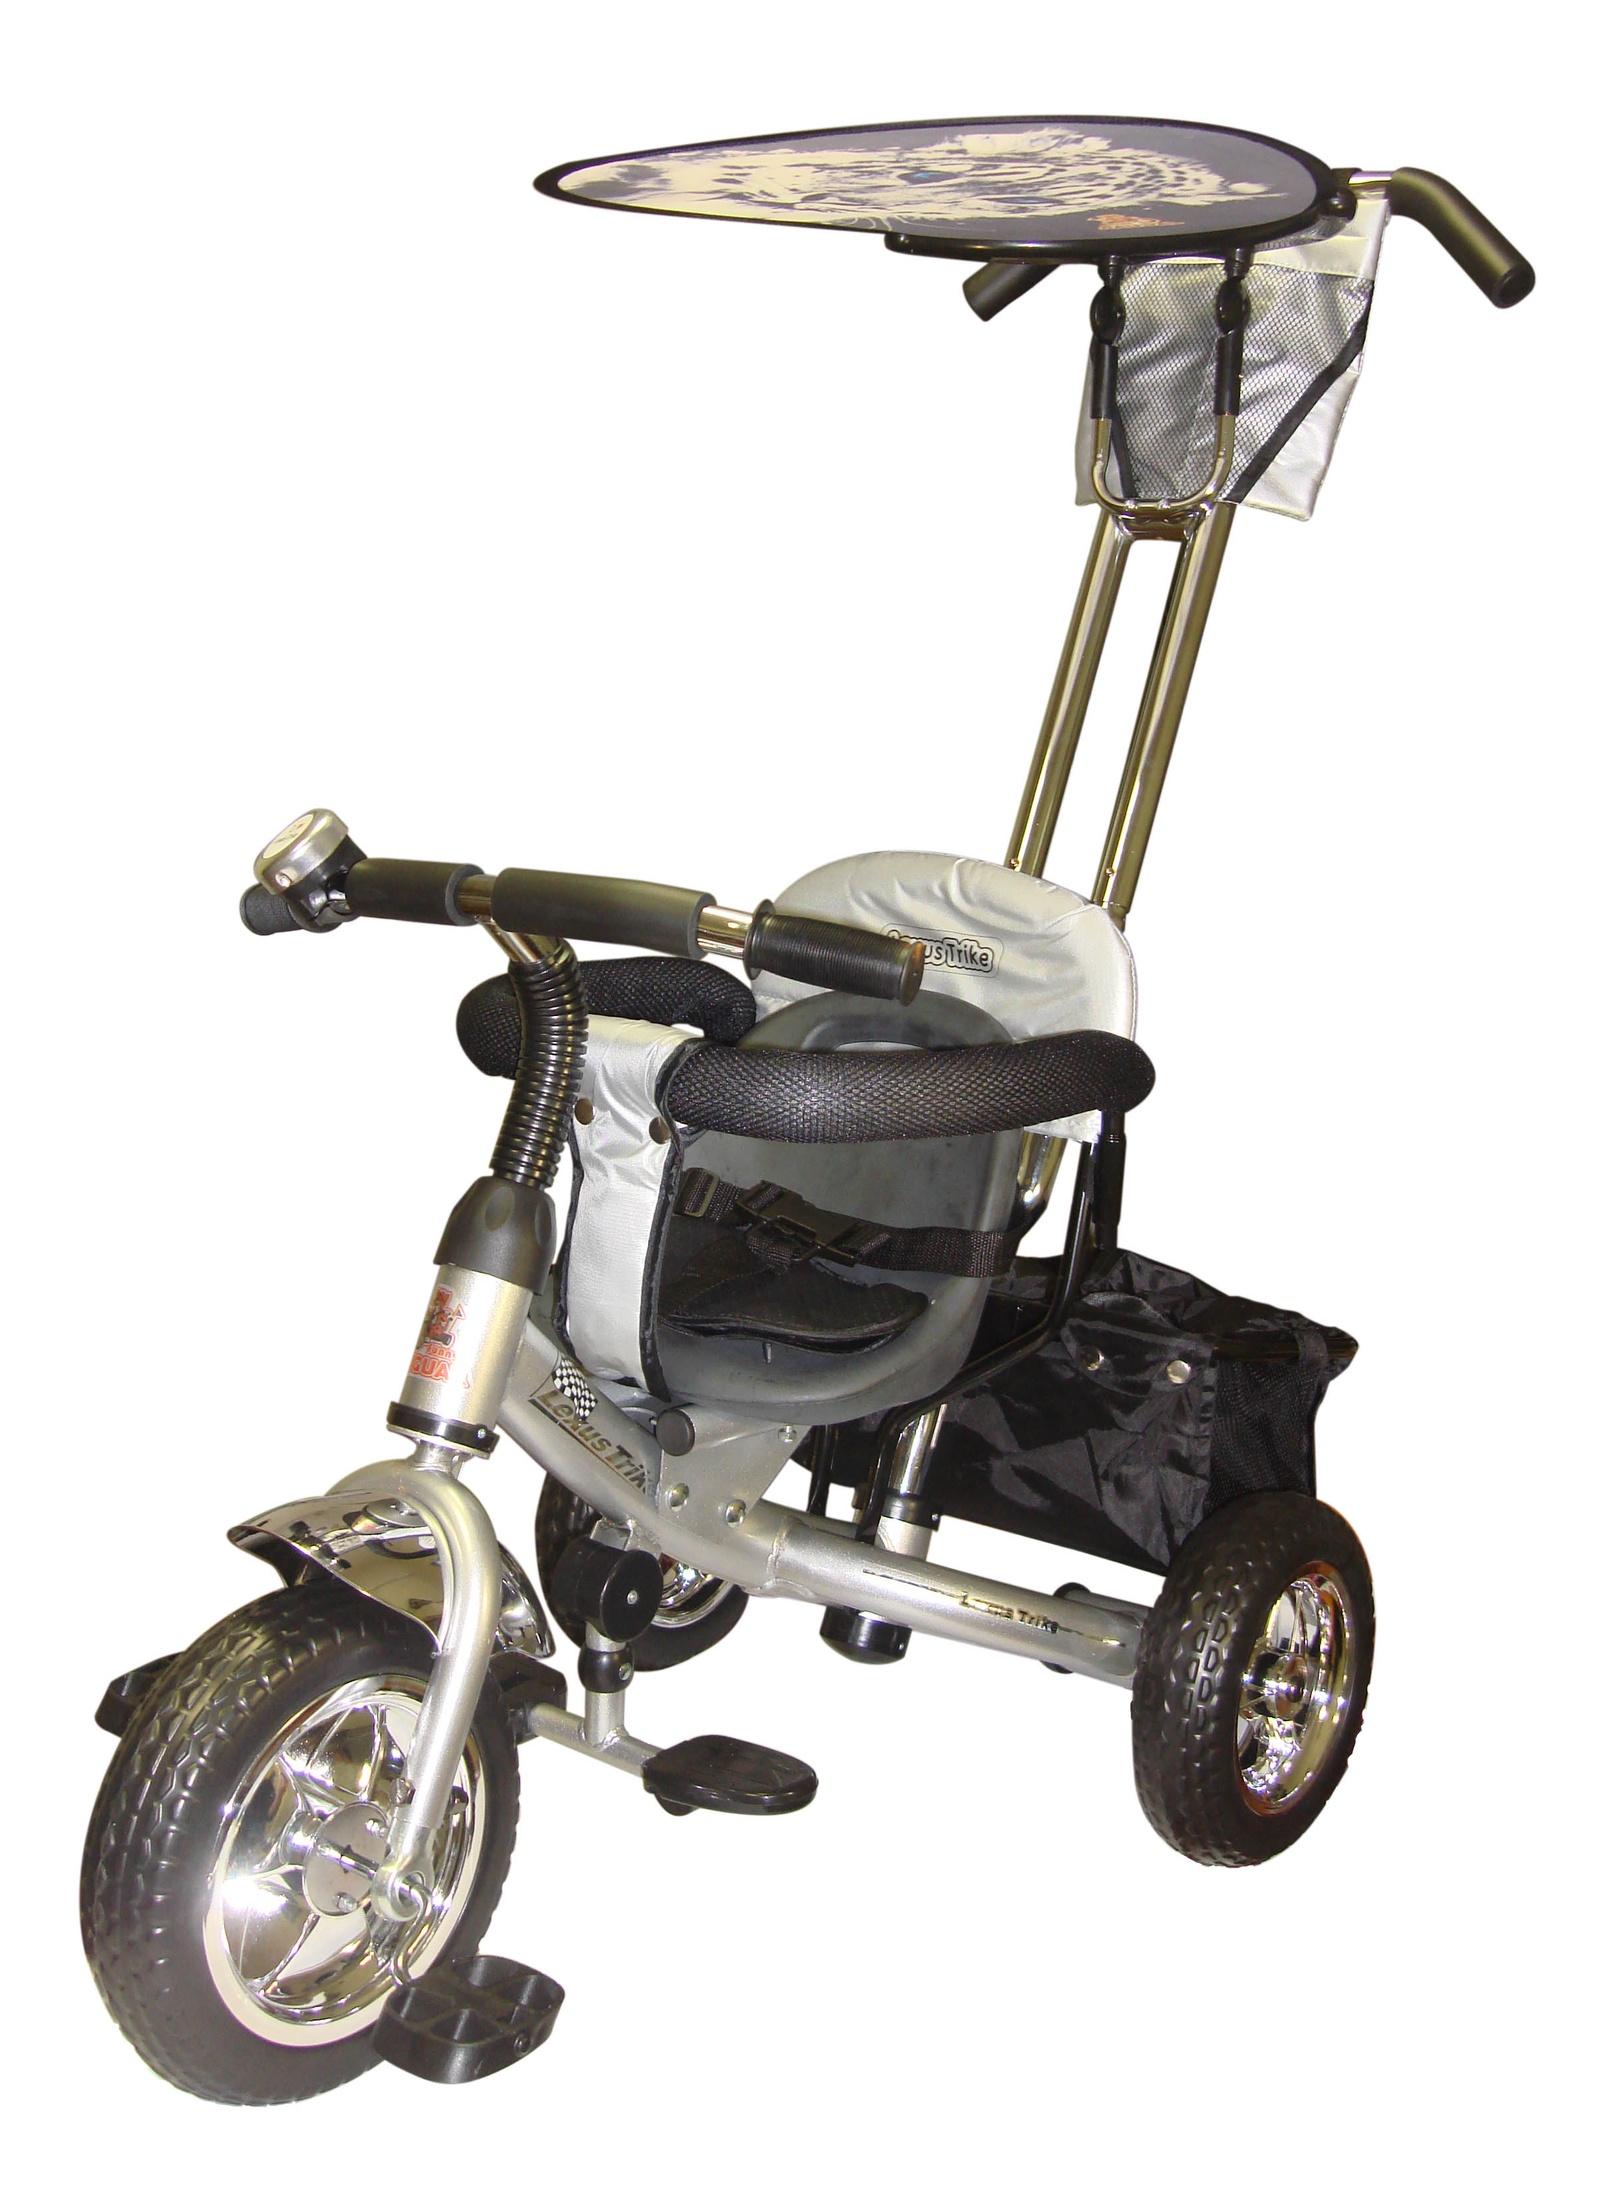 Велосипед Lexus Trike MS-0571, серебристый